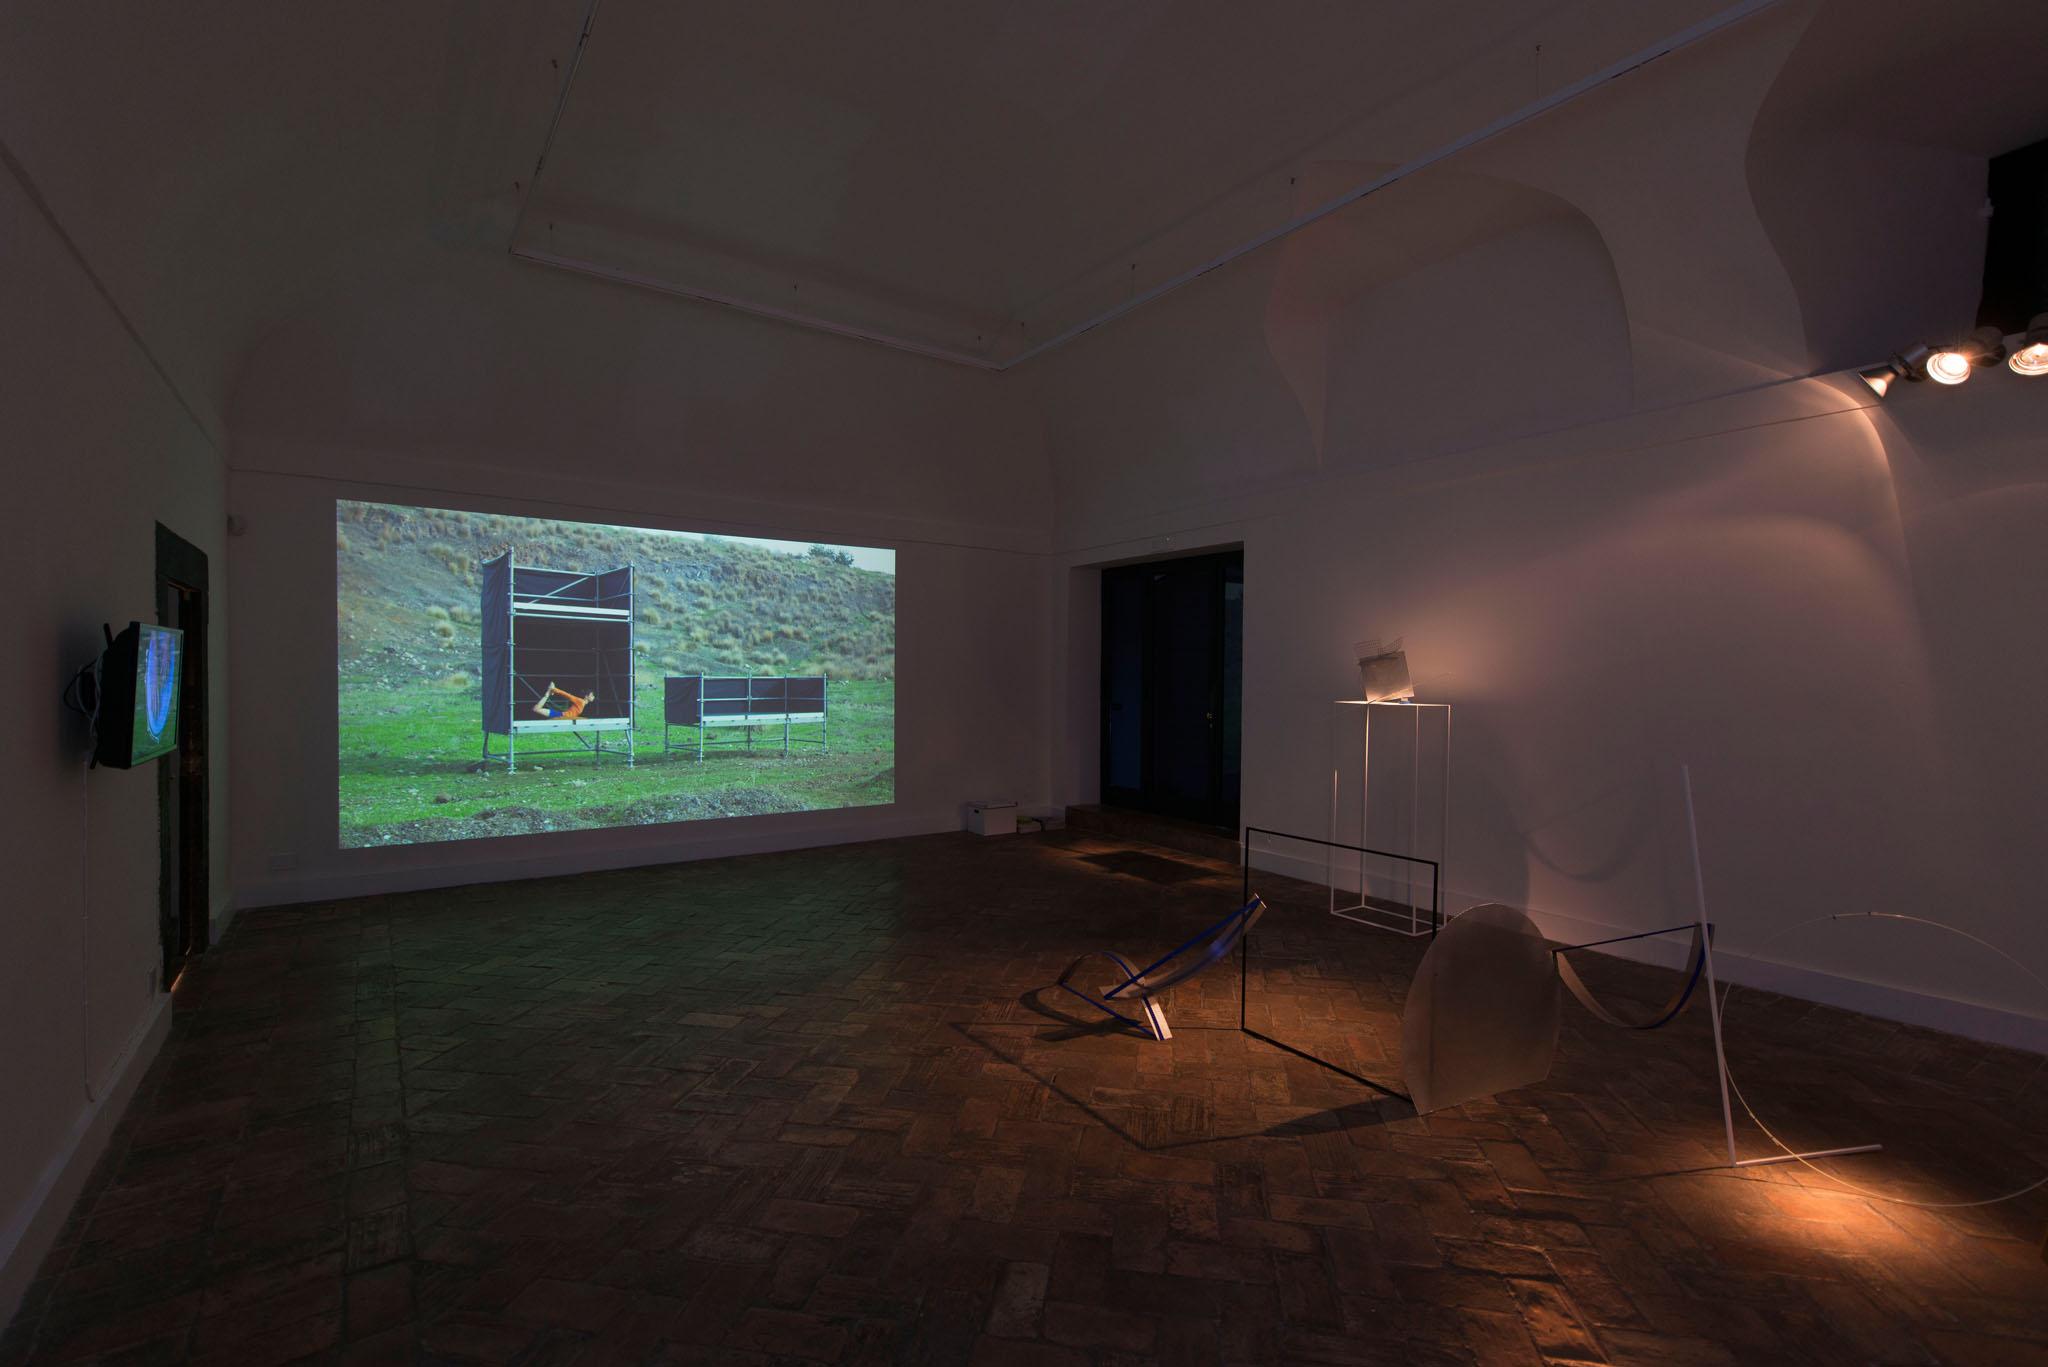 Tensioni E-Statiche, 2015, Installation view at Galleria Marie-Laure Fleisch. Courtesy Galleria Marie-Laure Fleisch and the artists. Photo: Giorgio Benni.